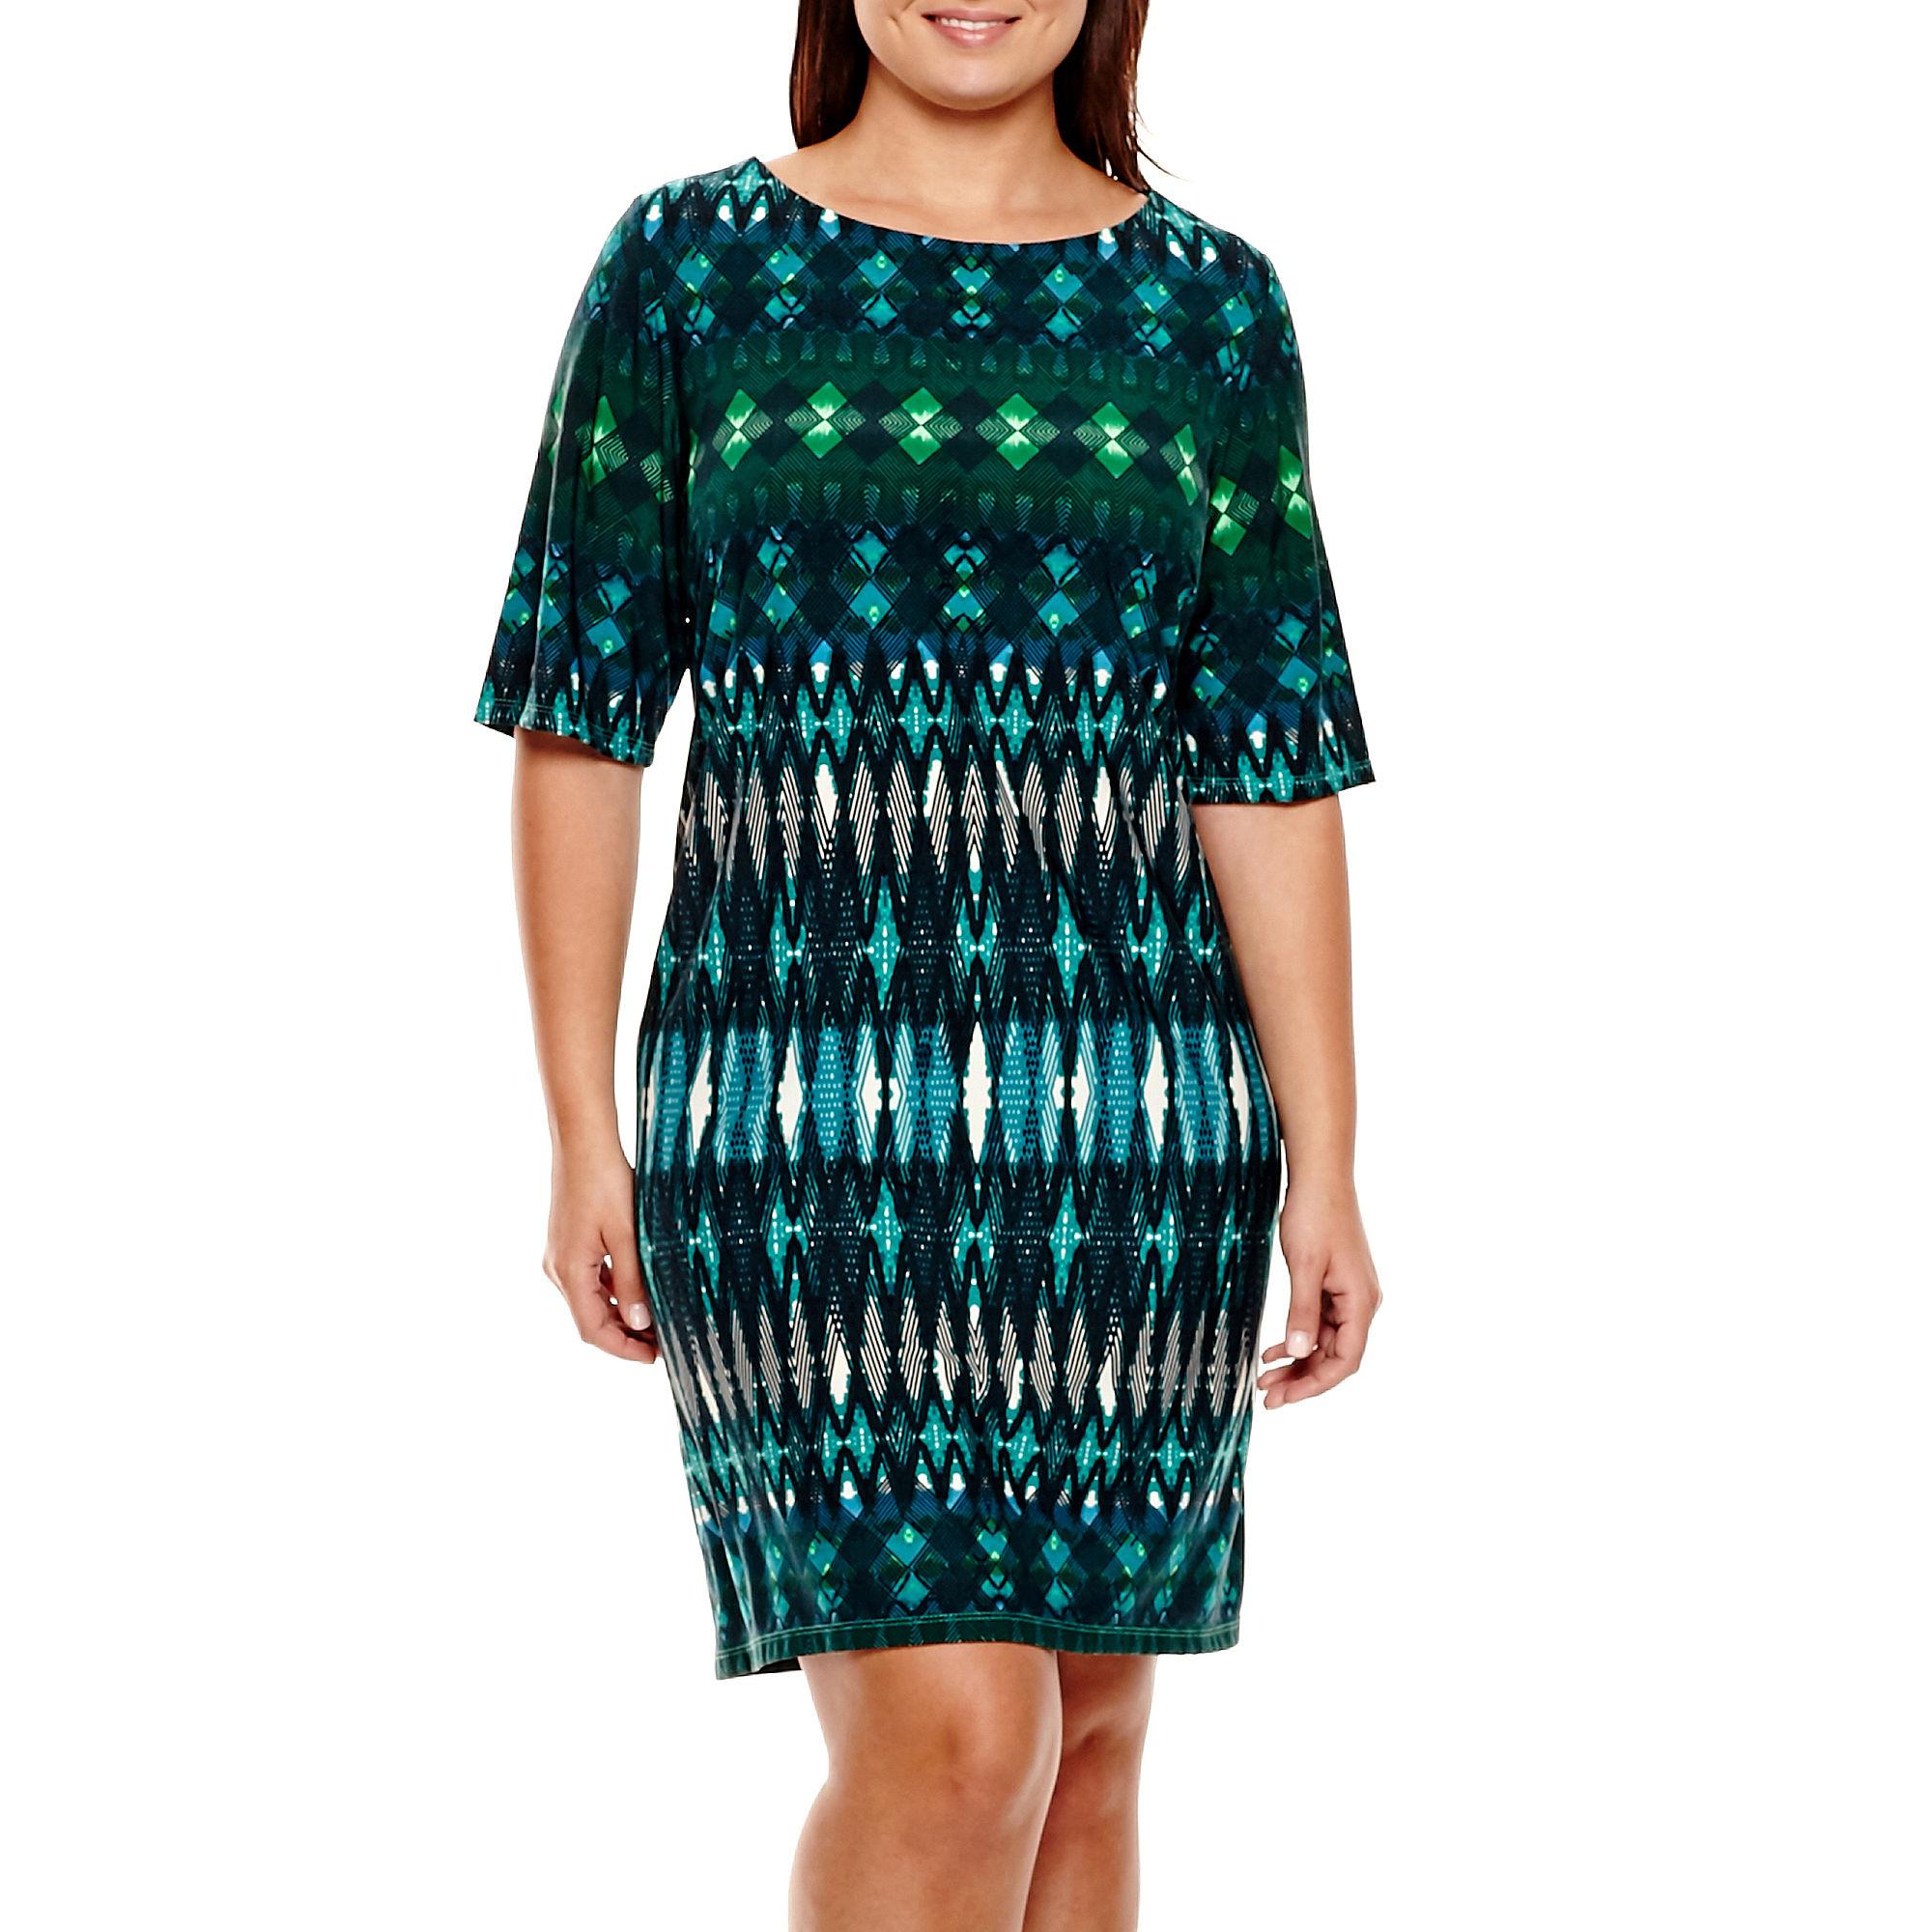 Studio 1 3/4-Sleeve Aztec Print Sheath Dress - Plus